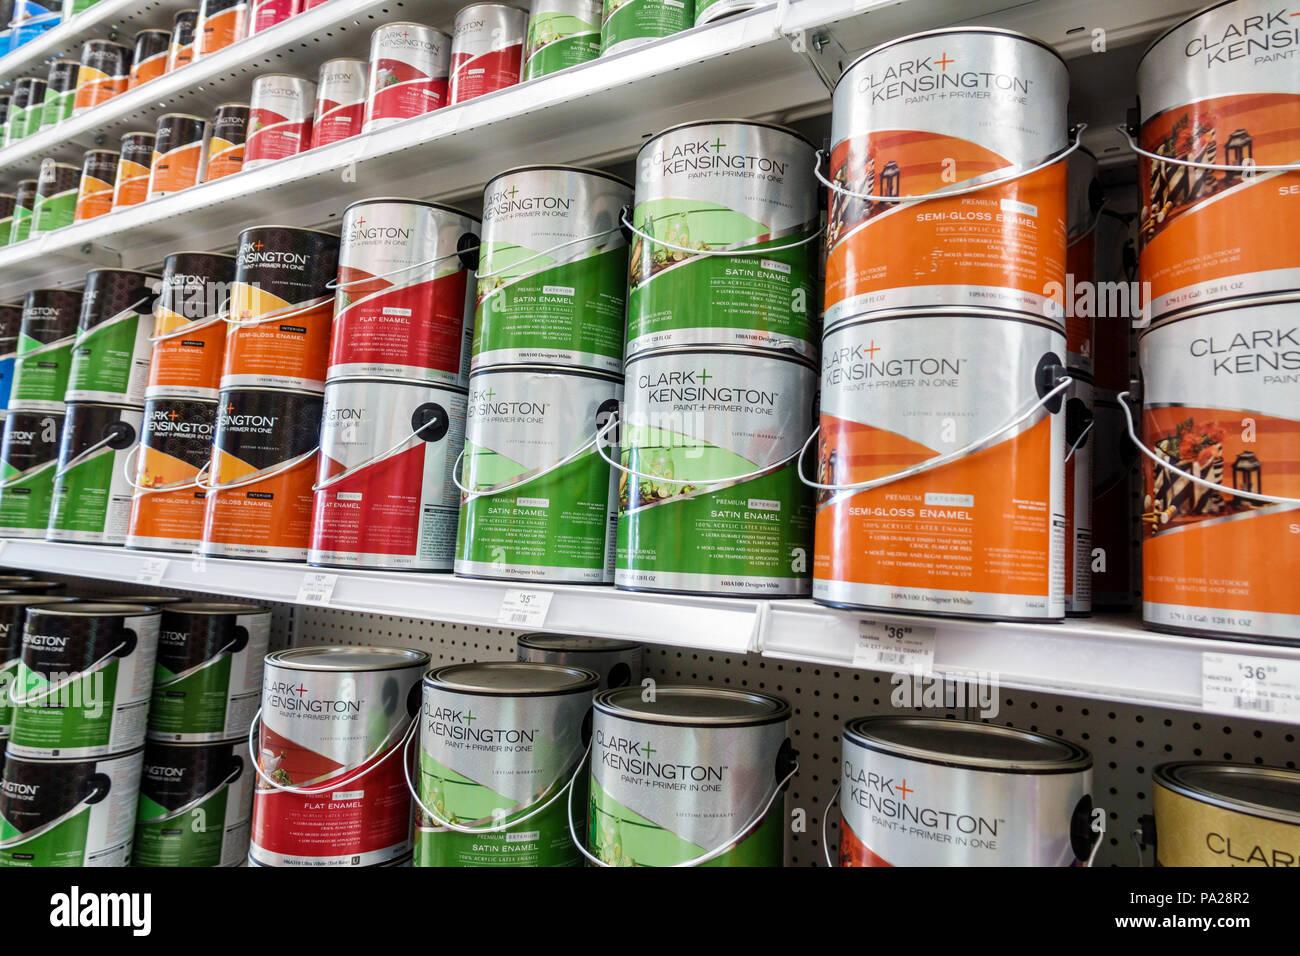 Florida Orlando Ace Hardware Household Hardware Home Improvement Gallon Paint Cans Clark Kensington Acrylic Latex Shelves Display Sale Inte Stock Photo Alamy